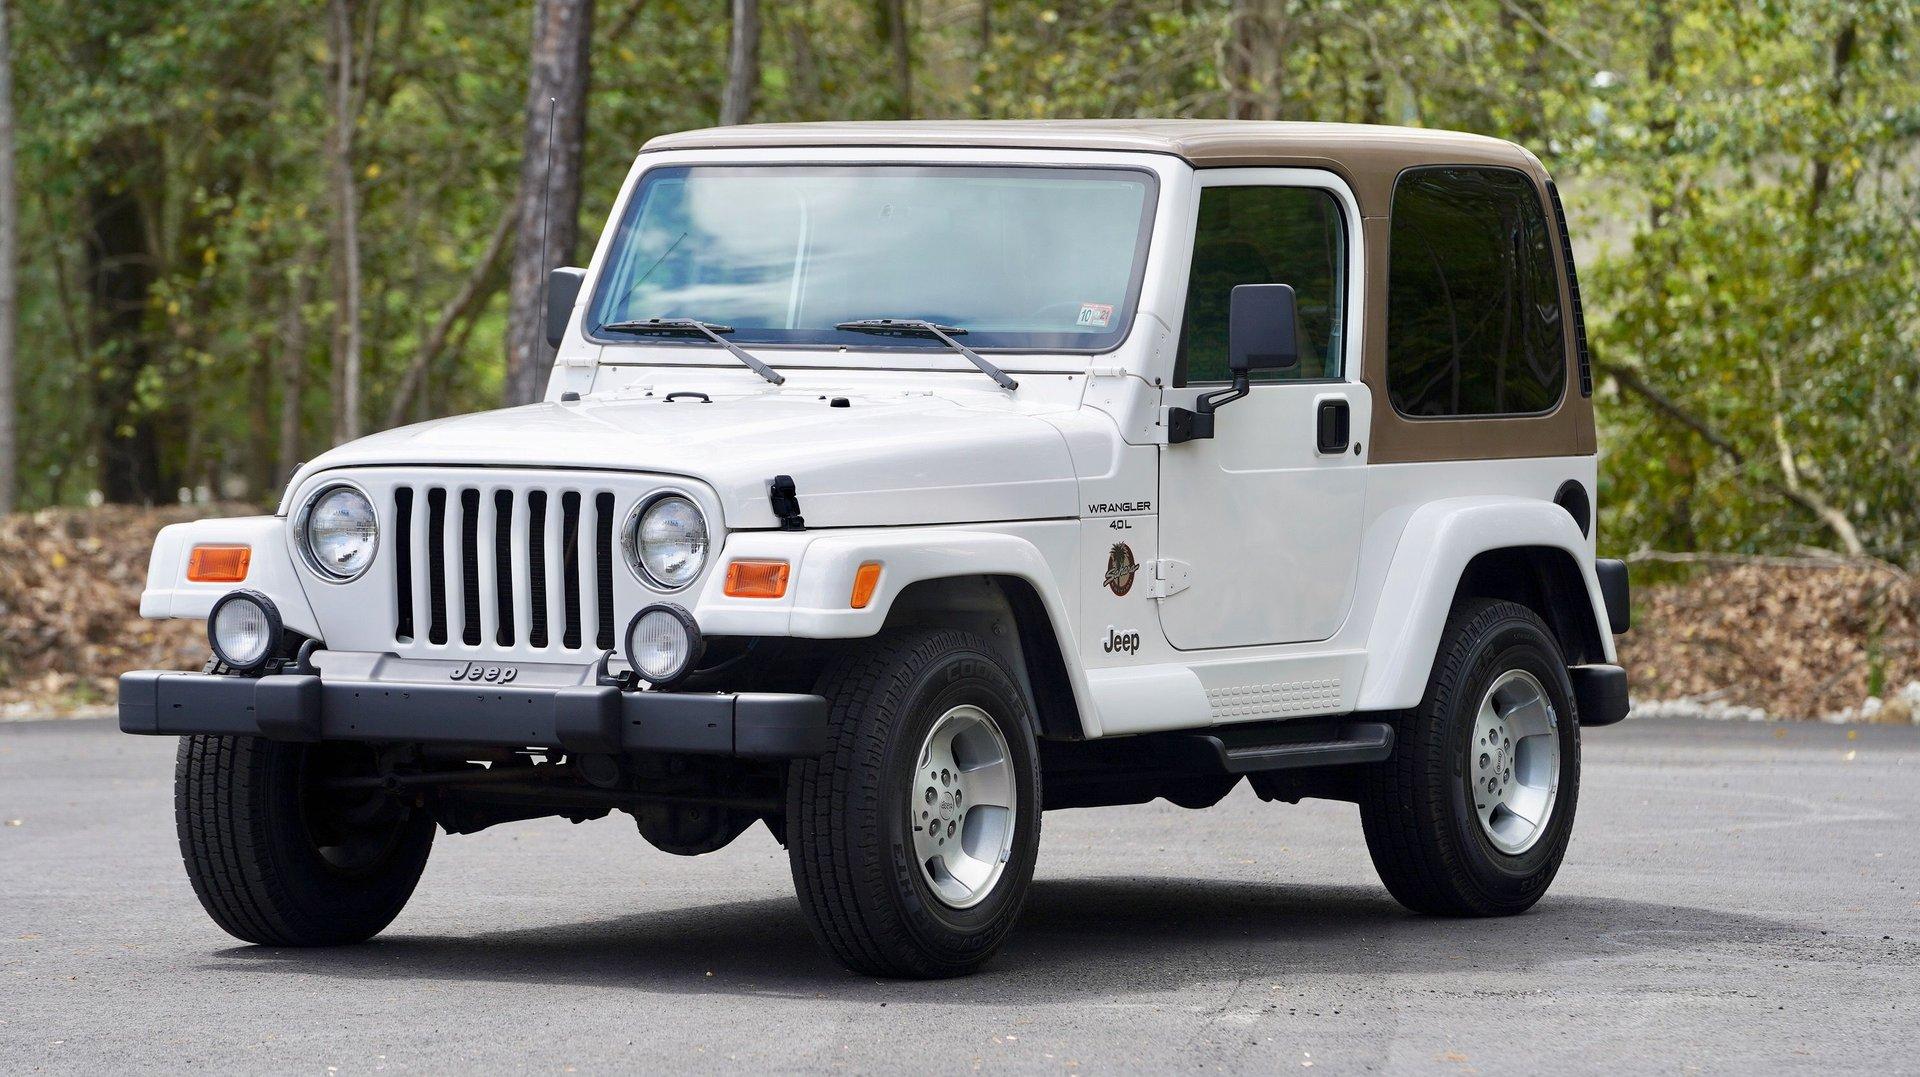 2001 jeep wrangler 2dr sahara